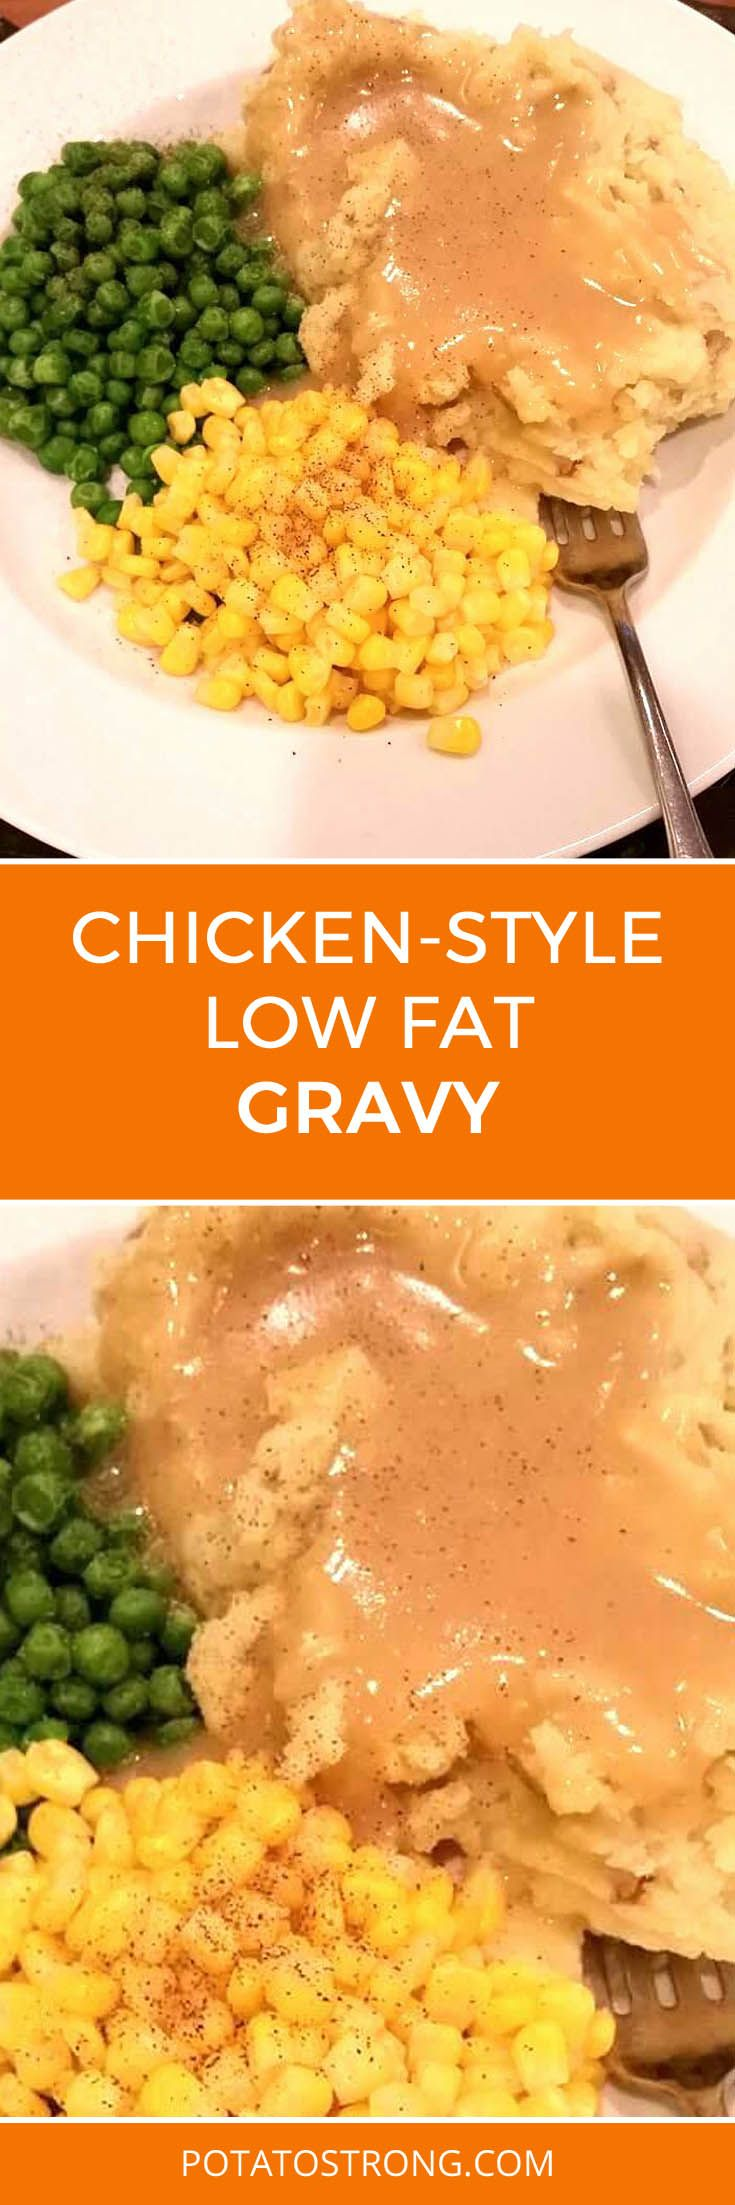 Chicken Style Low Fat Gravy Meals Gravy Vegan Gravy Potato Gravy